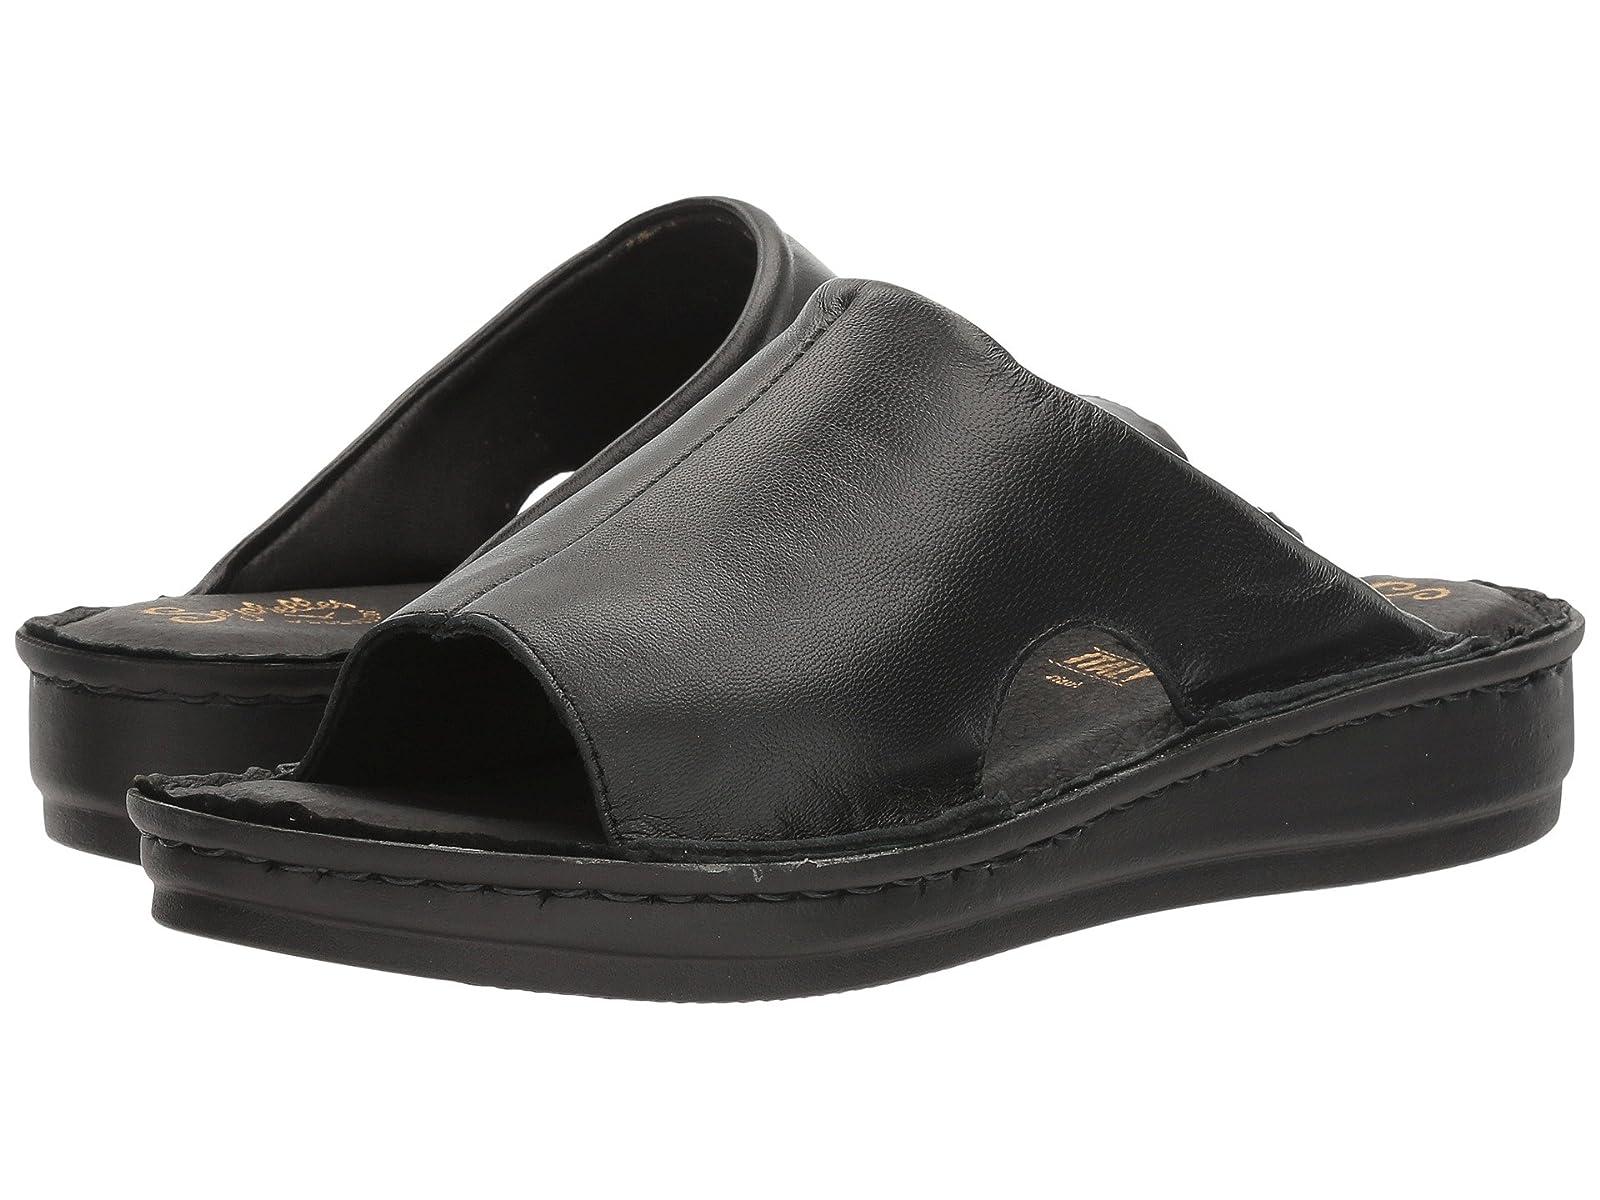 Men/Women:Seychelles Ultimately : : : Up-to-date styling 014924